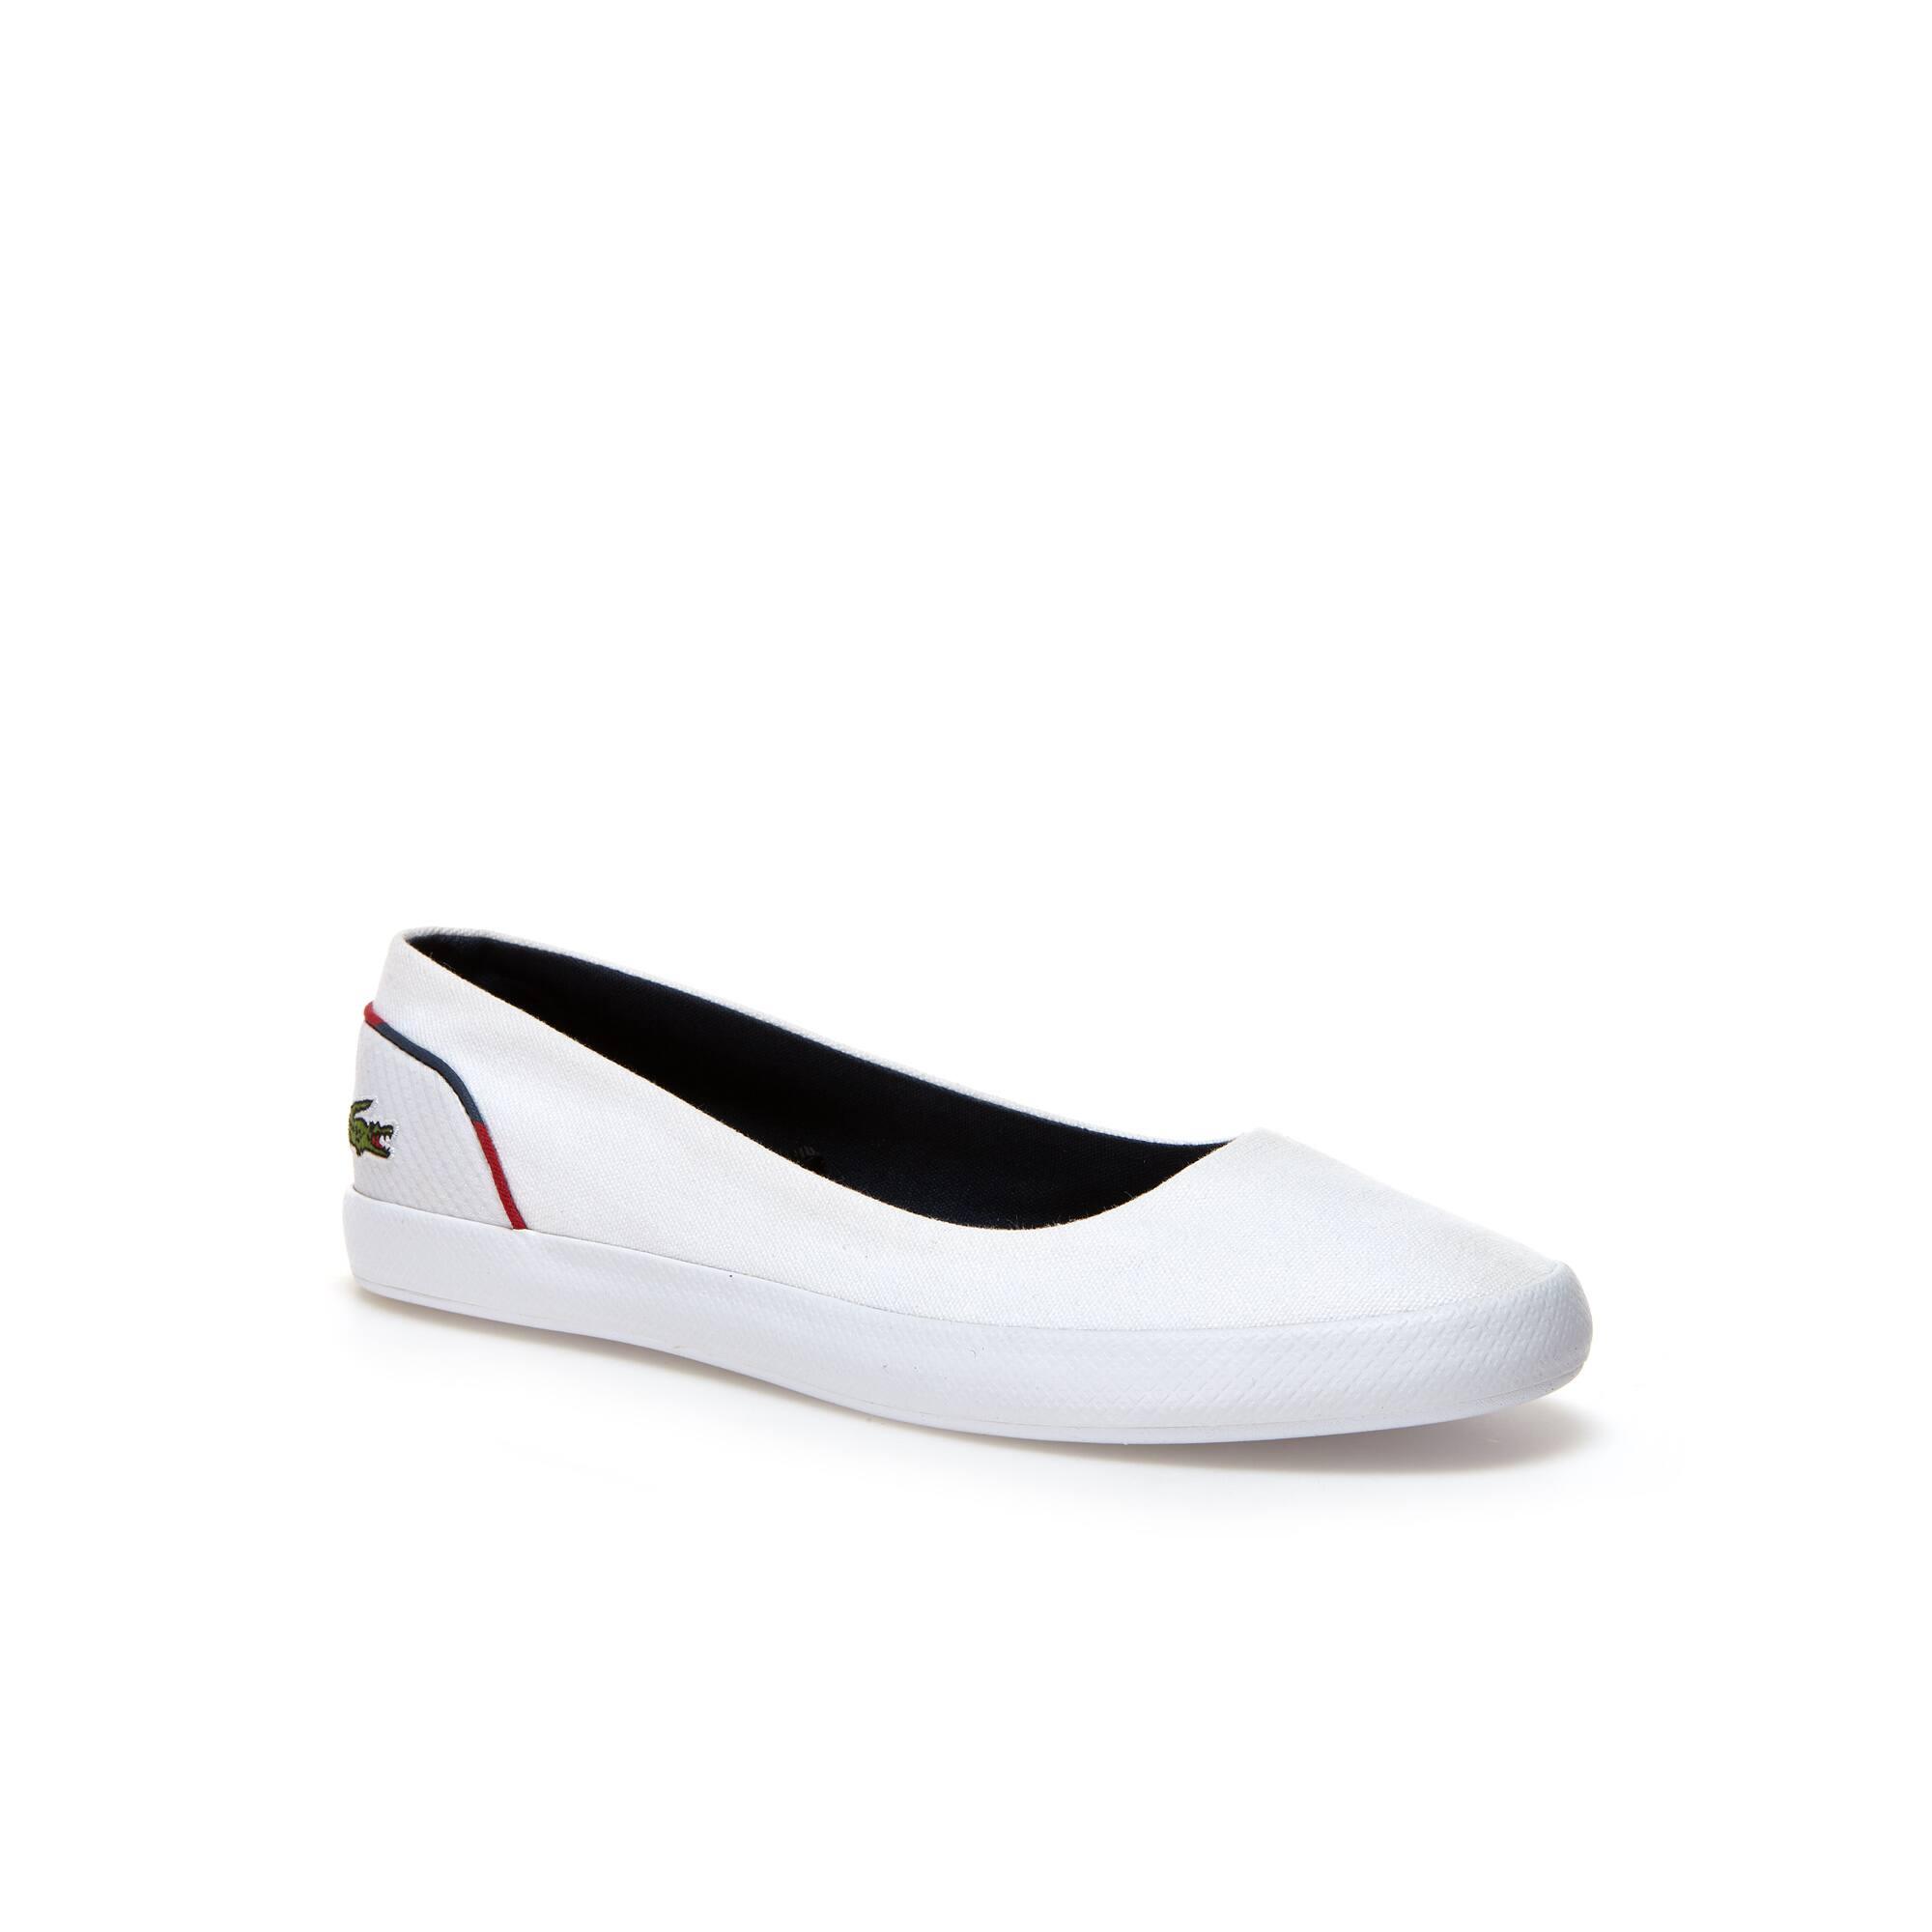 Zapatillas Sin Cordones Mujer Lancelle Ballerina De Loneta